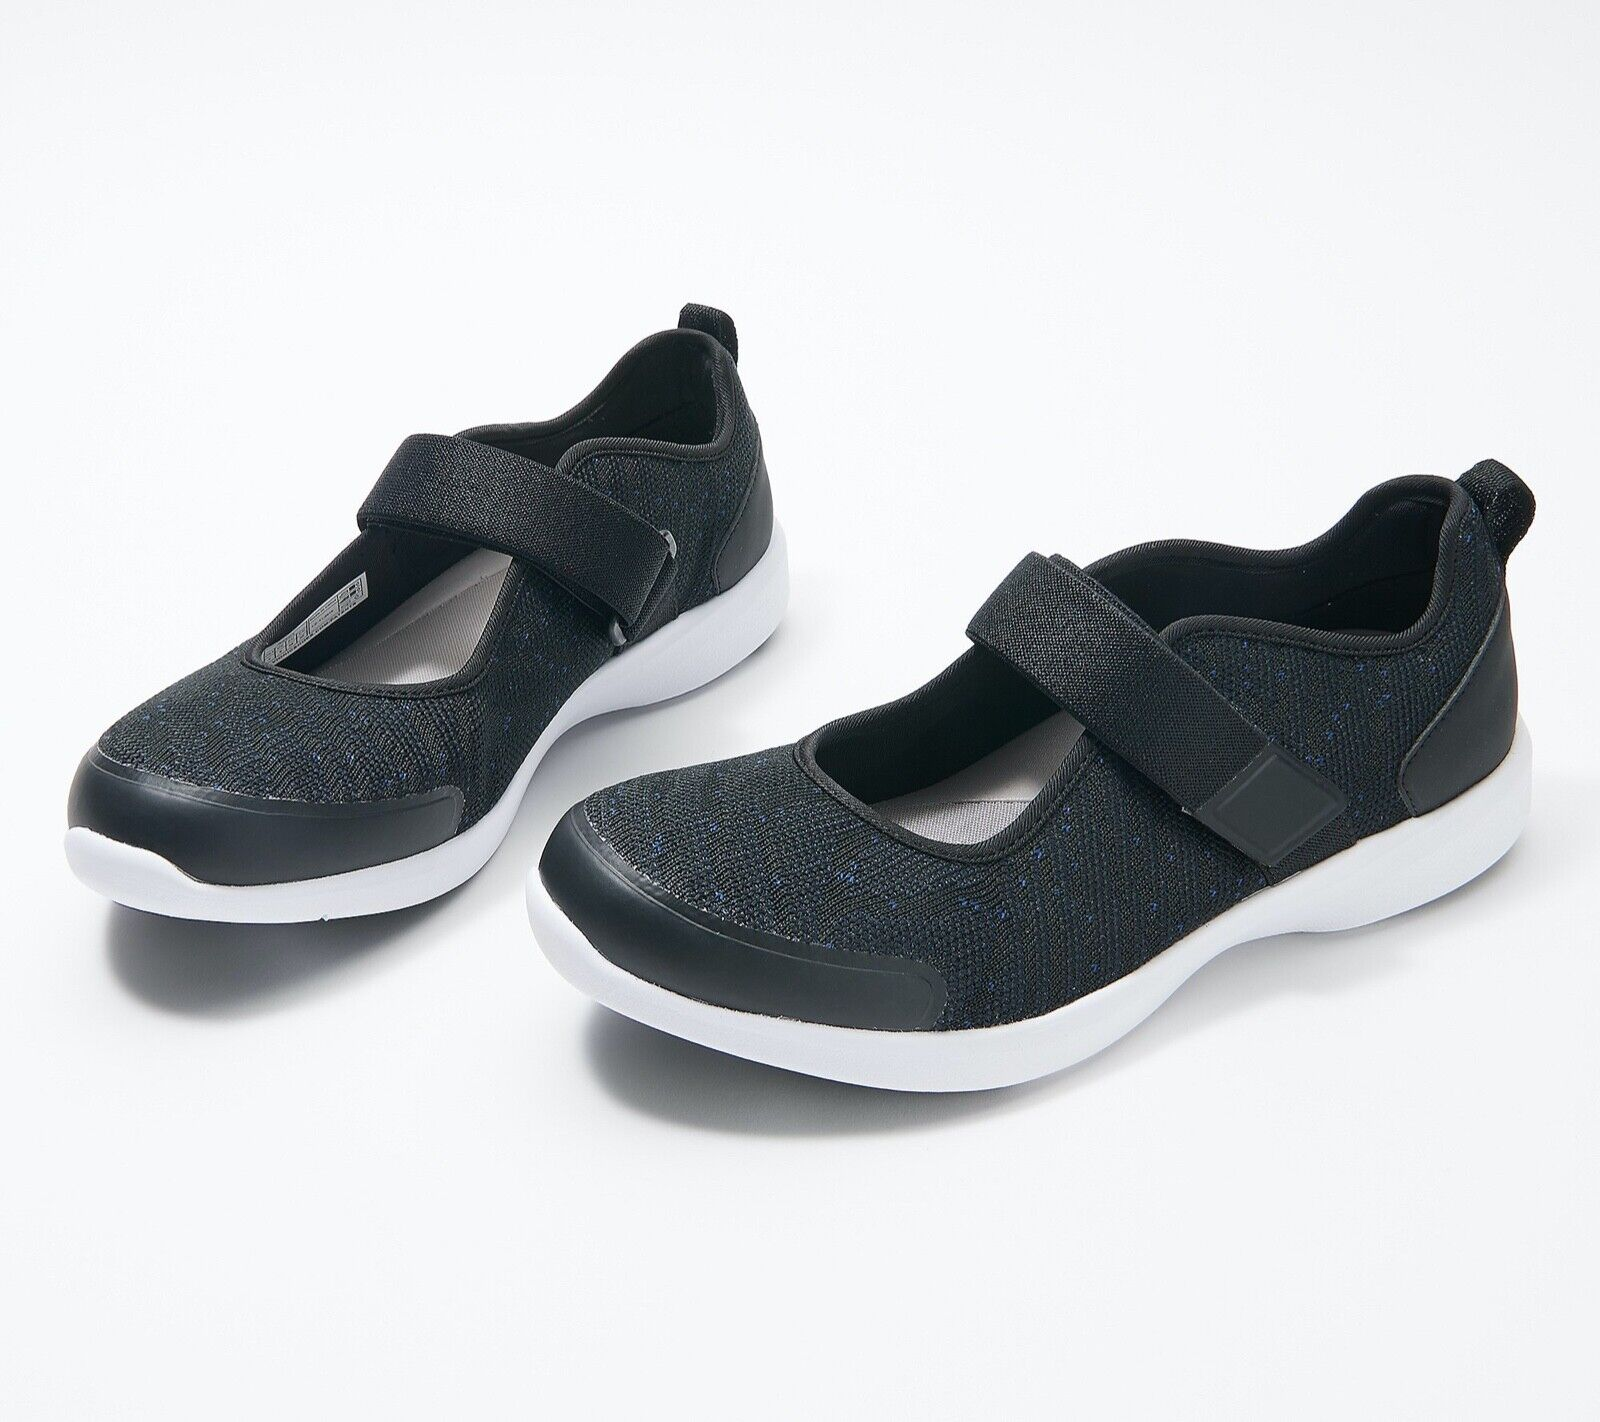 Vionic Mesh Adjustable Mary Jane Sneakers BLACK***Free Shipp